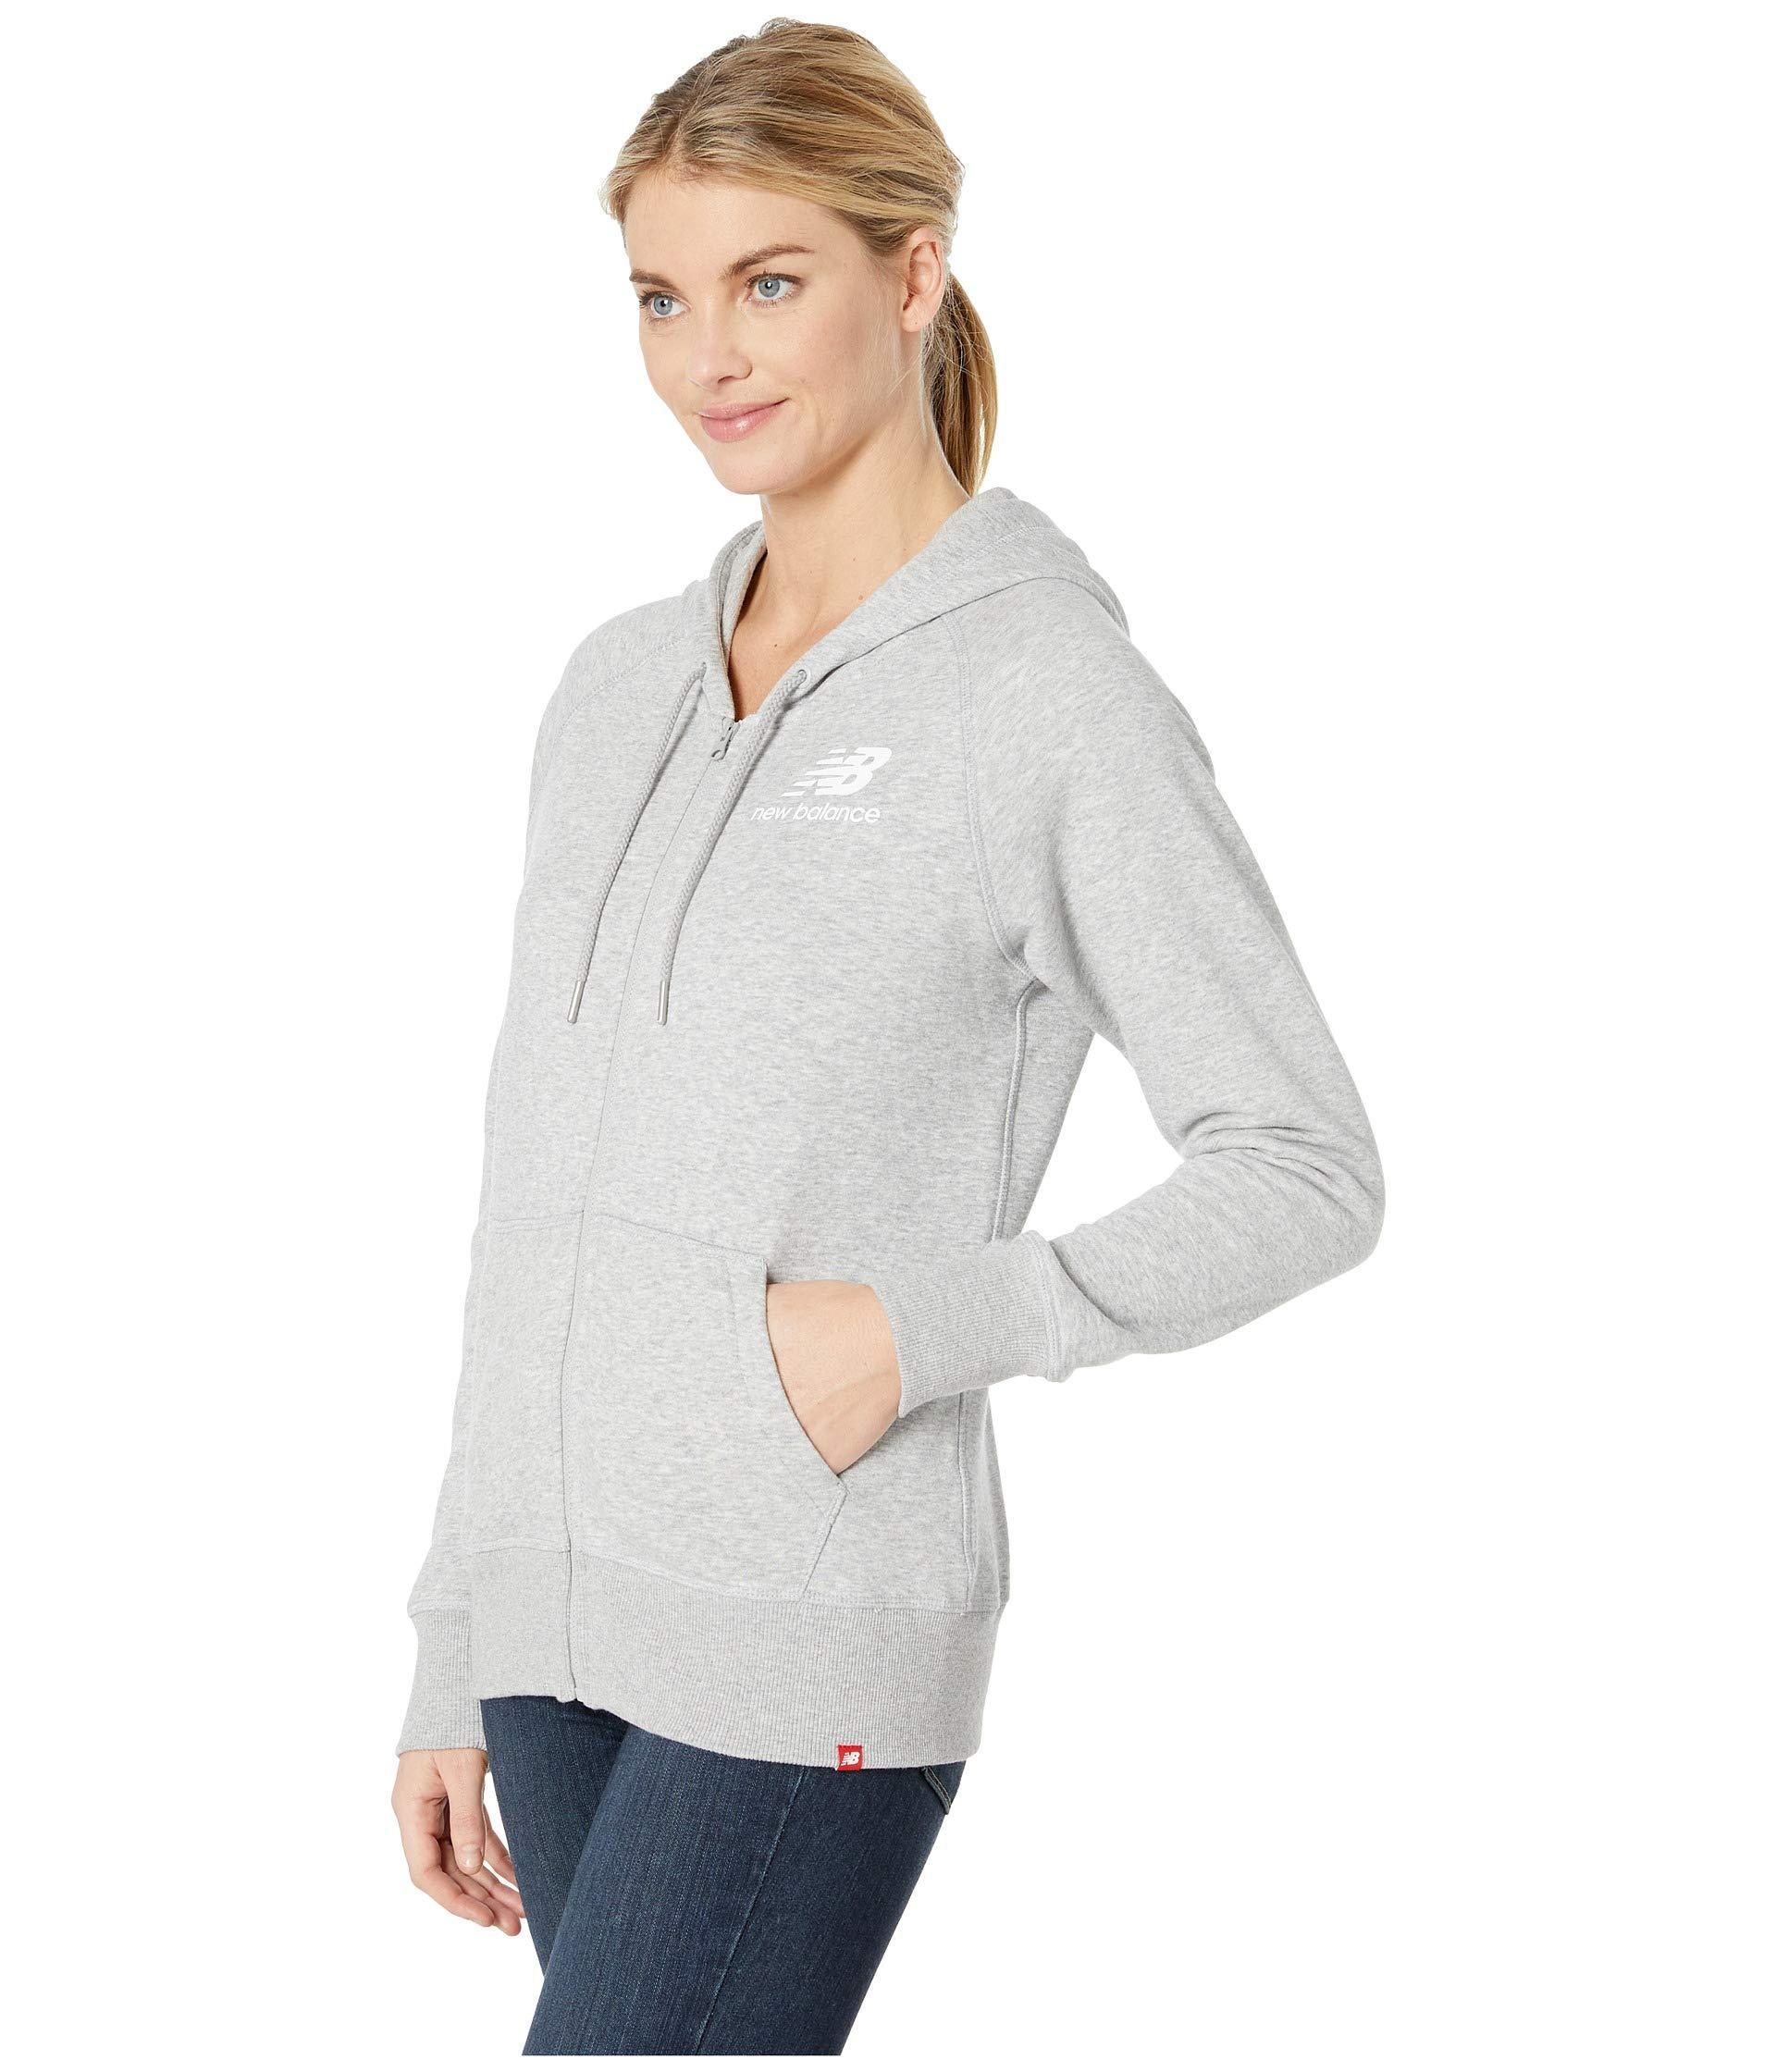 8efc7afb267b4 Lyst - New Balance Essentials Full Zip Hoodie (pigment) Women's Sweatshirt  in Gray